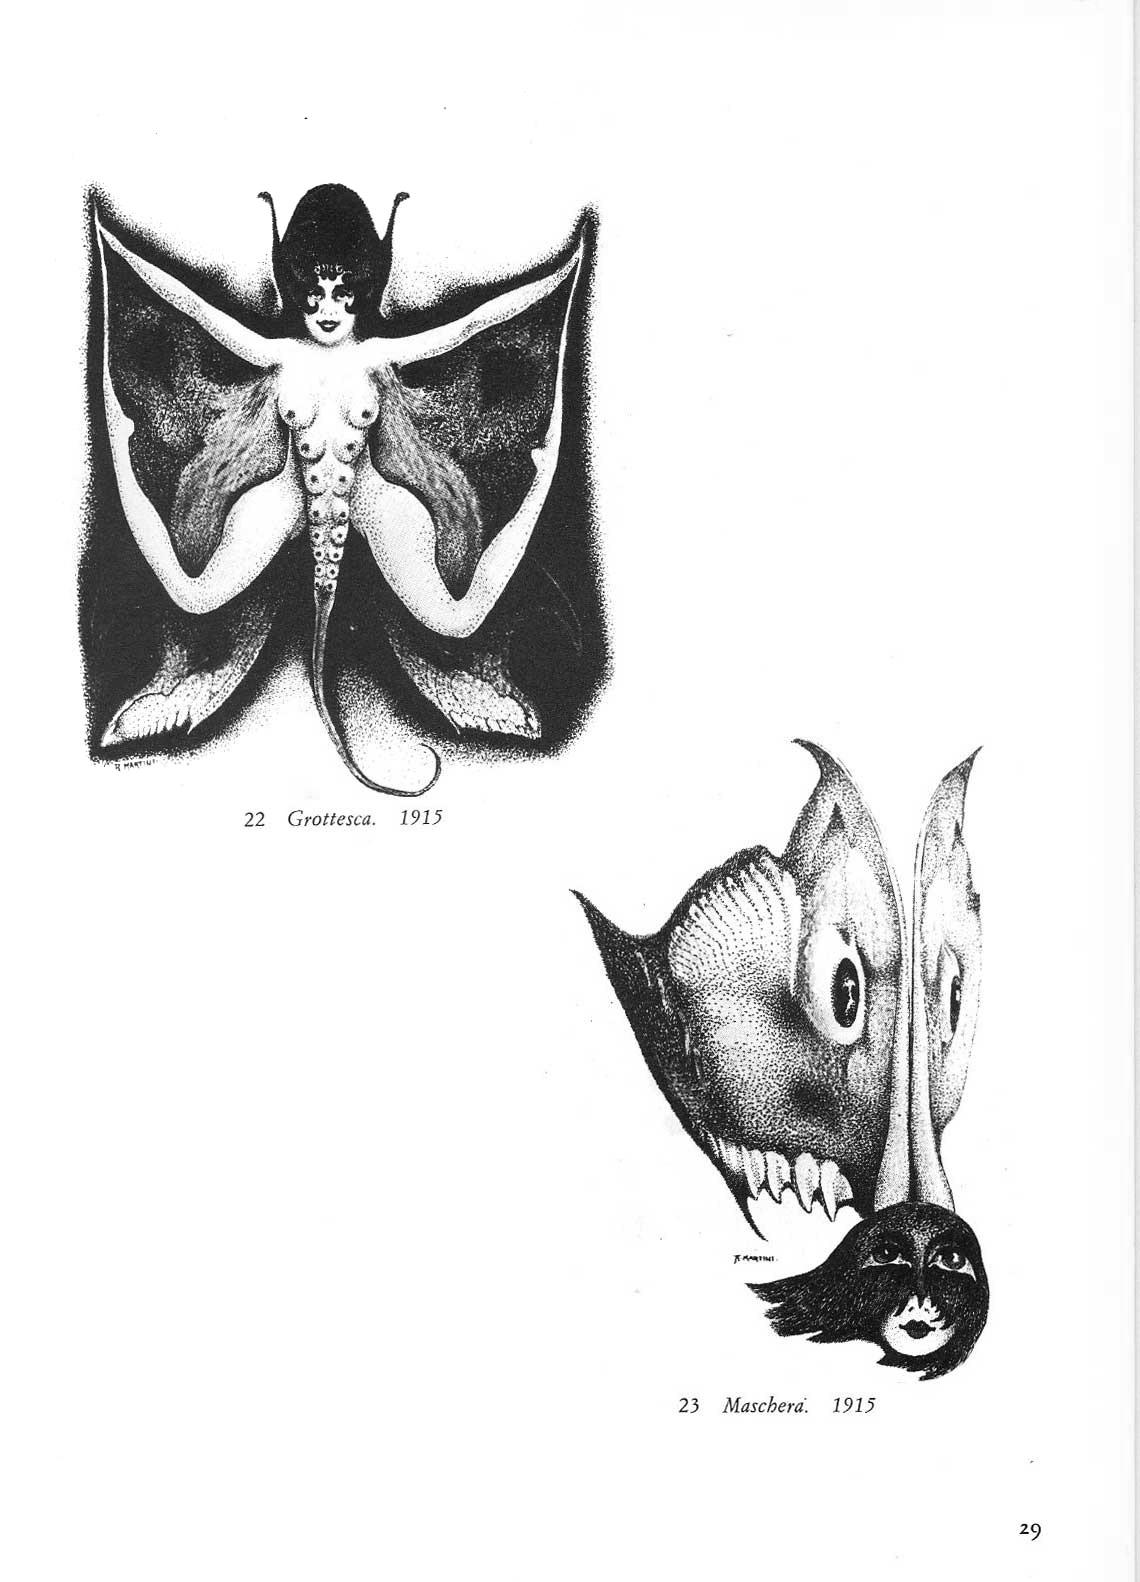 Alberto Martini - Grotesque, Mask, 1915